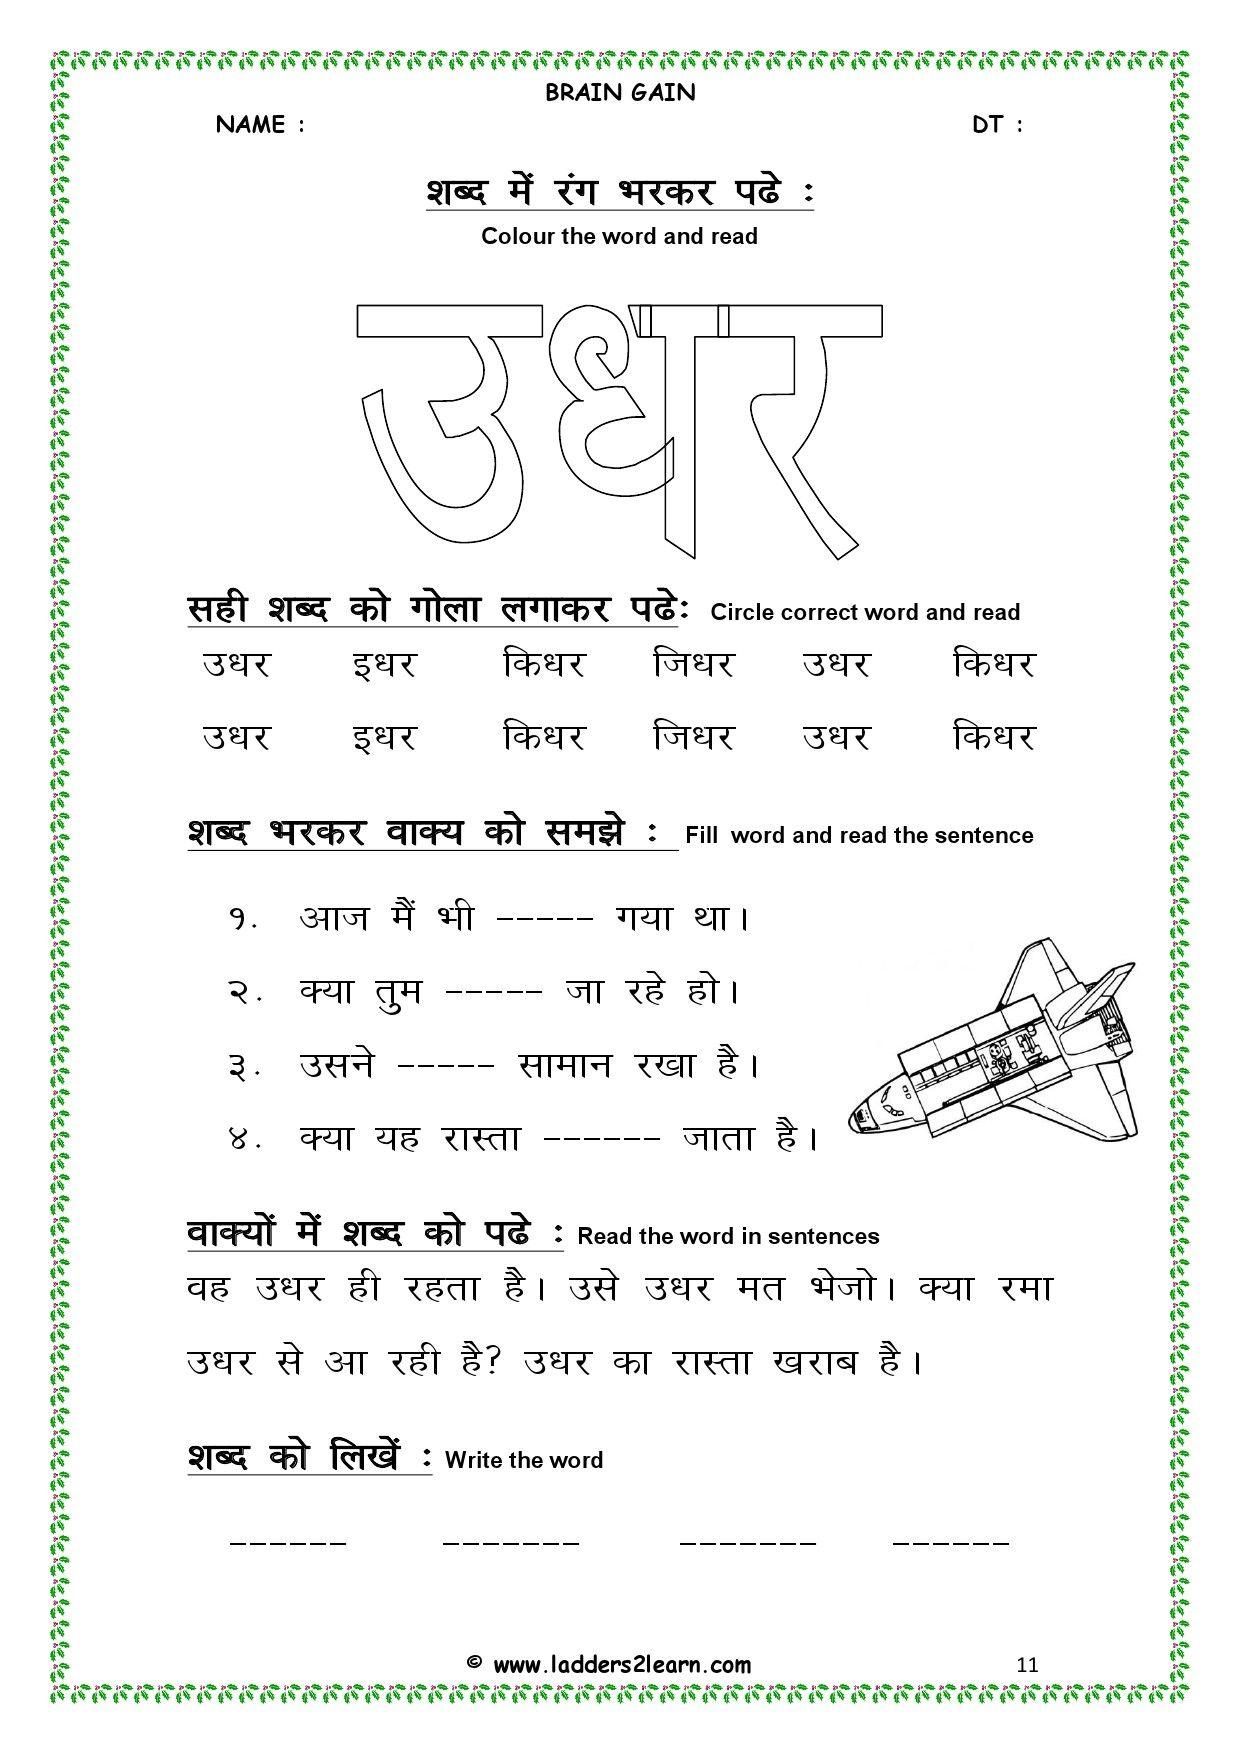 Hindi 3 Letter Sight Word Worksheet Sight Word Worksheets Hindi Worksheets Words [ 1754 x 1240 Pixel ]